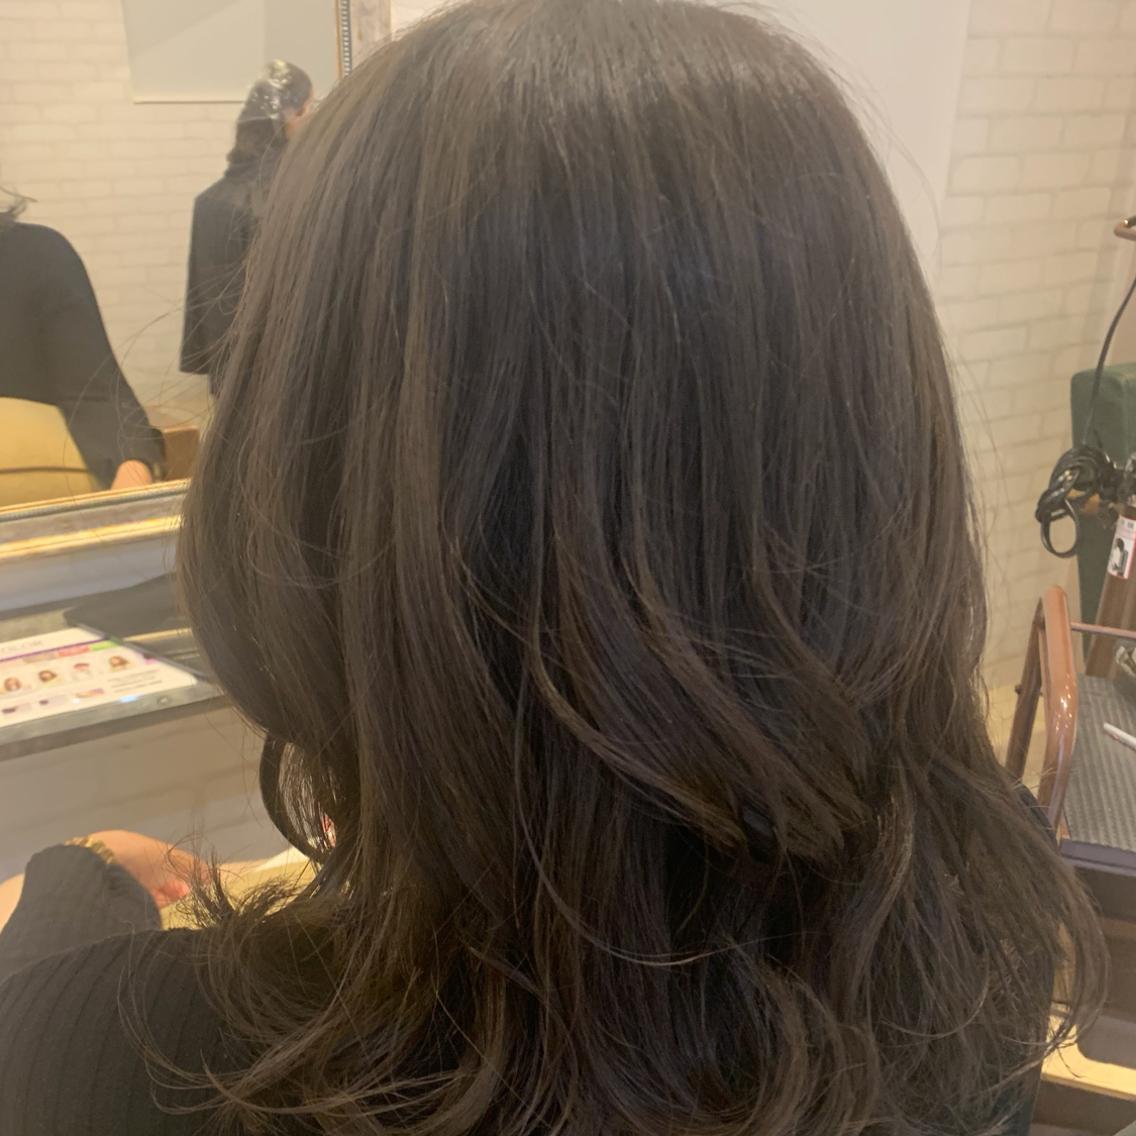 Hair&carecotton所属・手島エレン明美の掲載